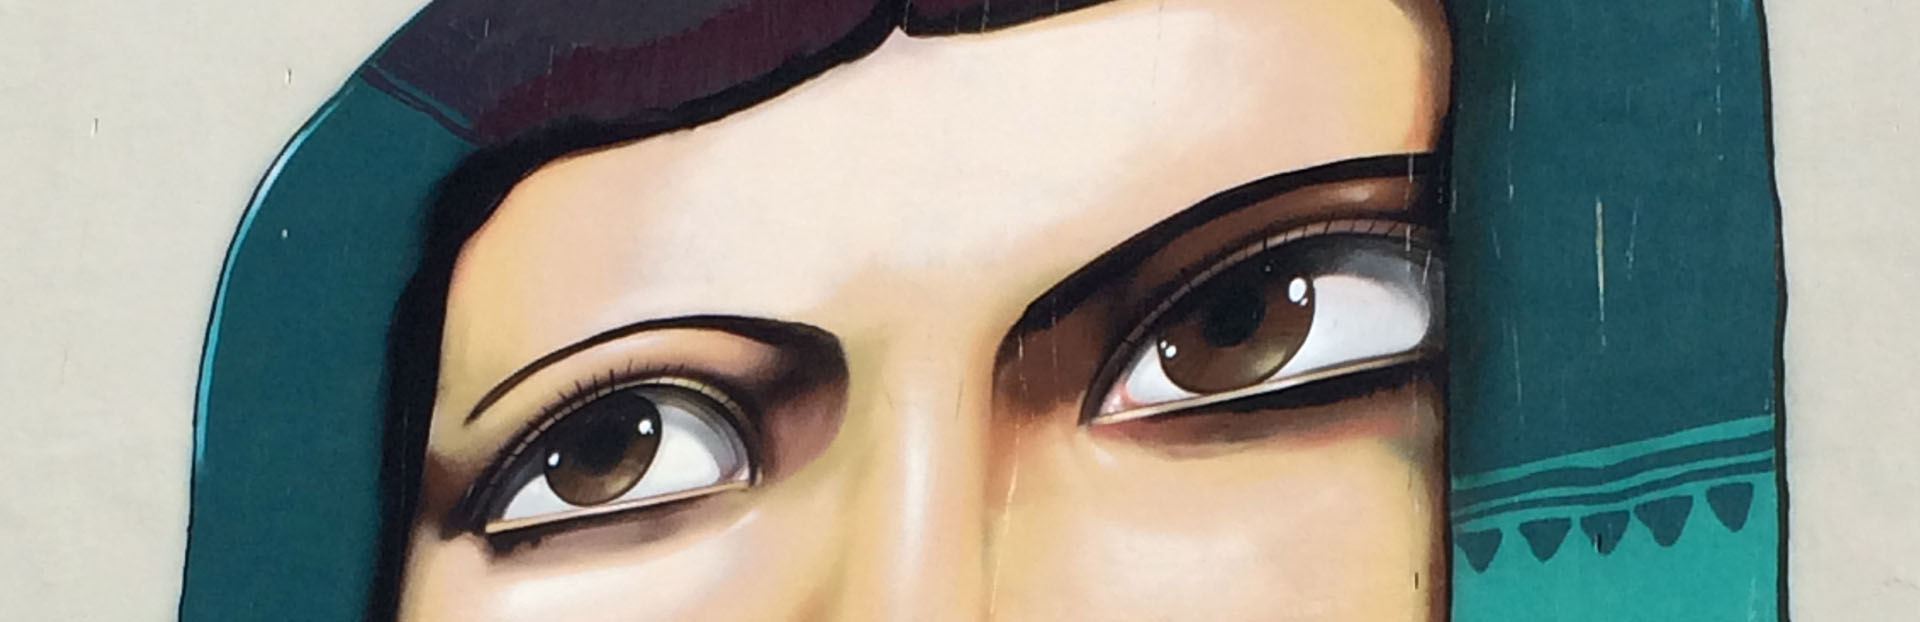 Falko eyes